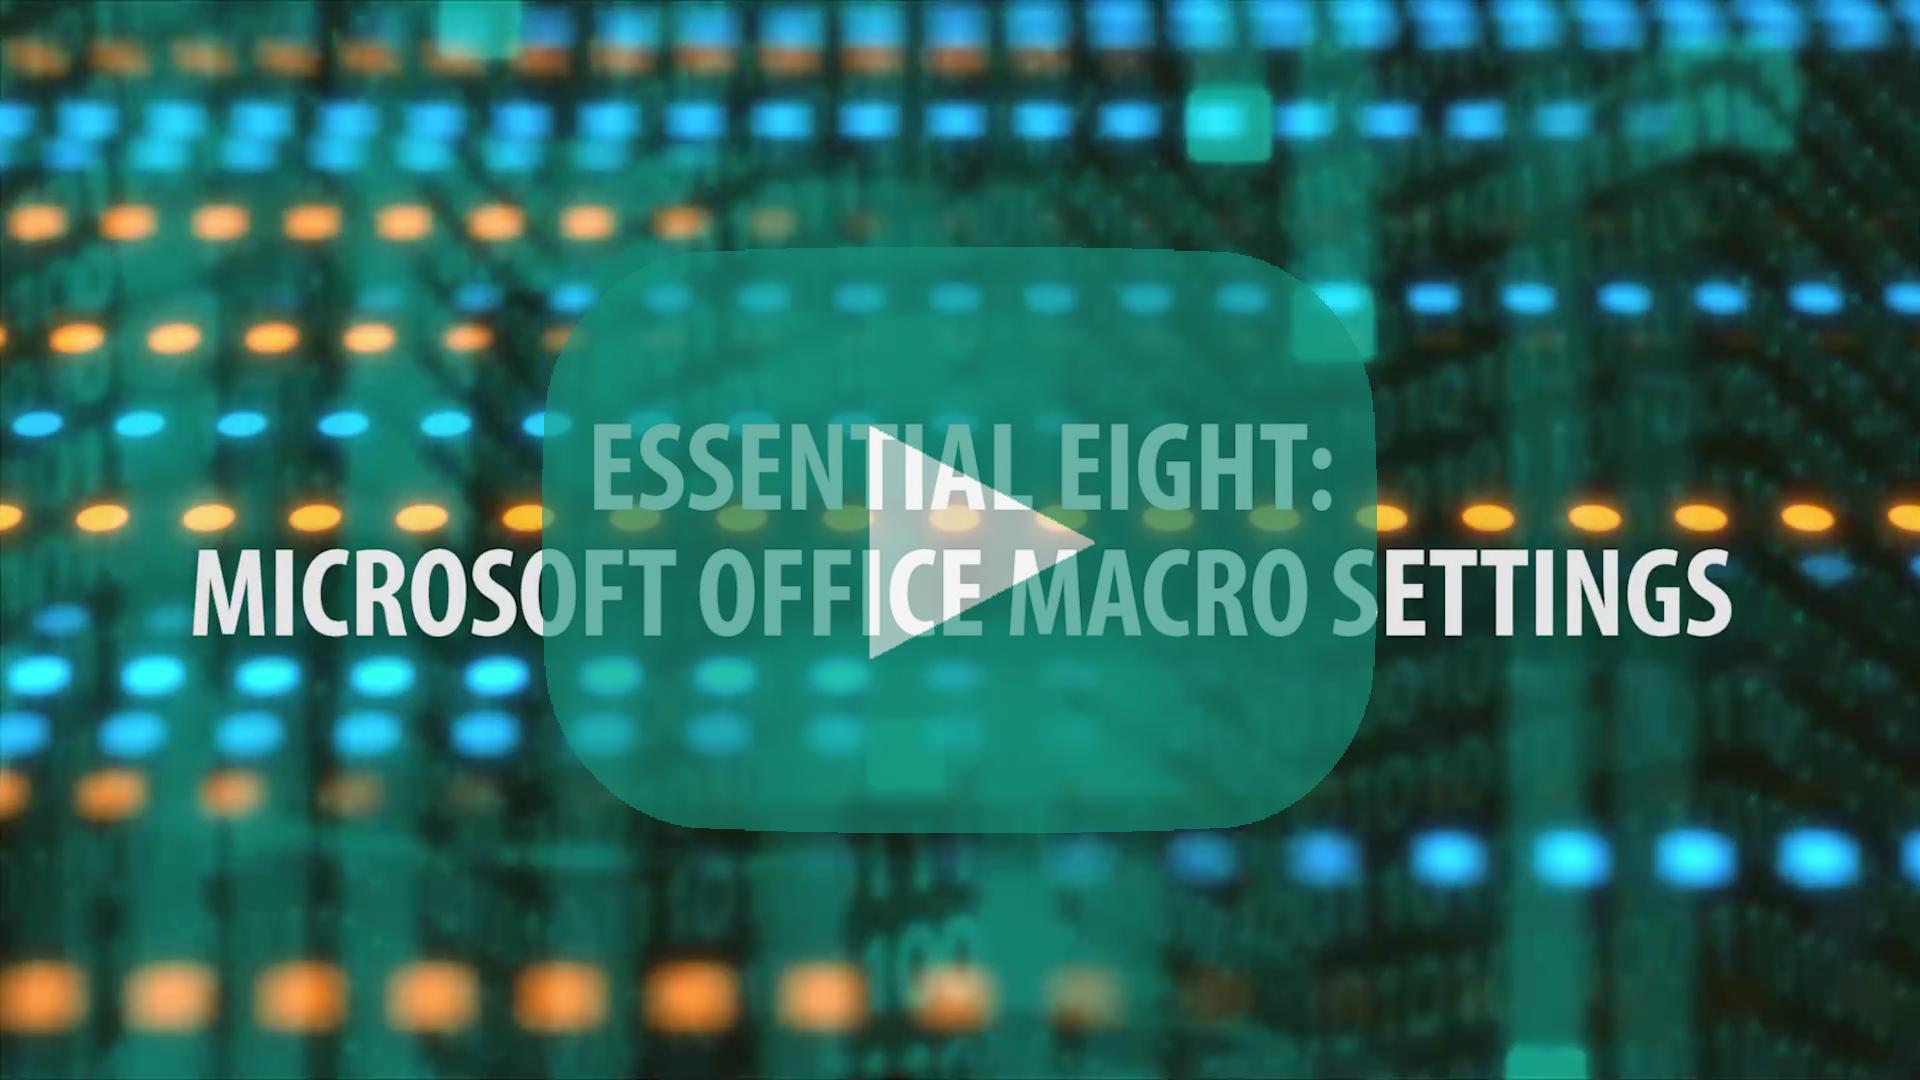 E8 Topic 5: Configure Microsoft Office macro settings